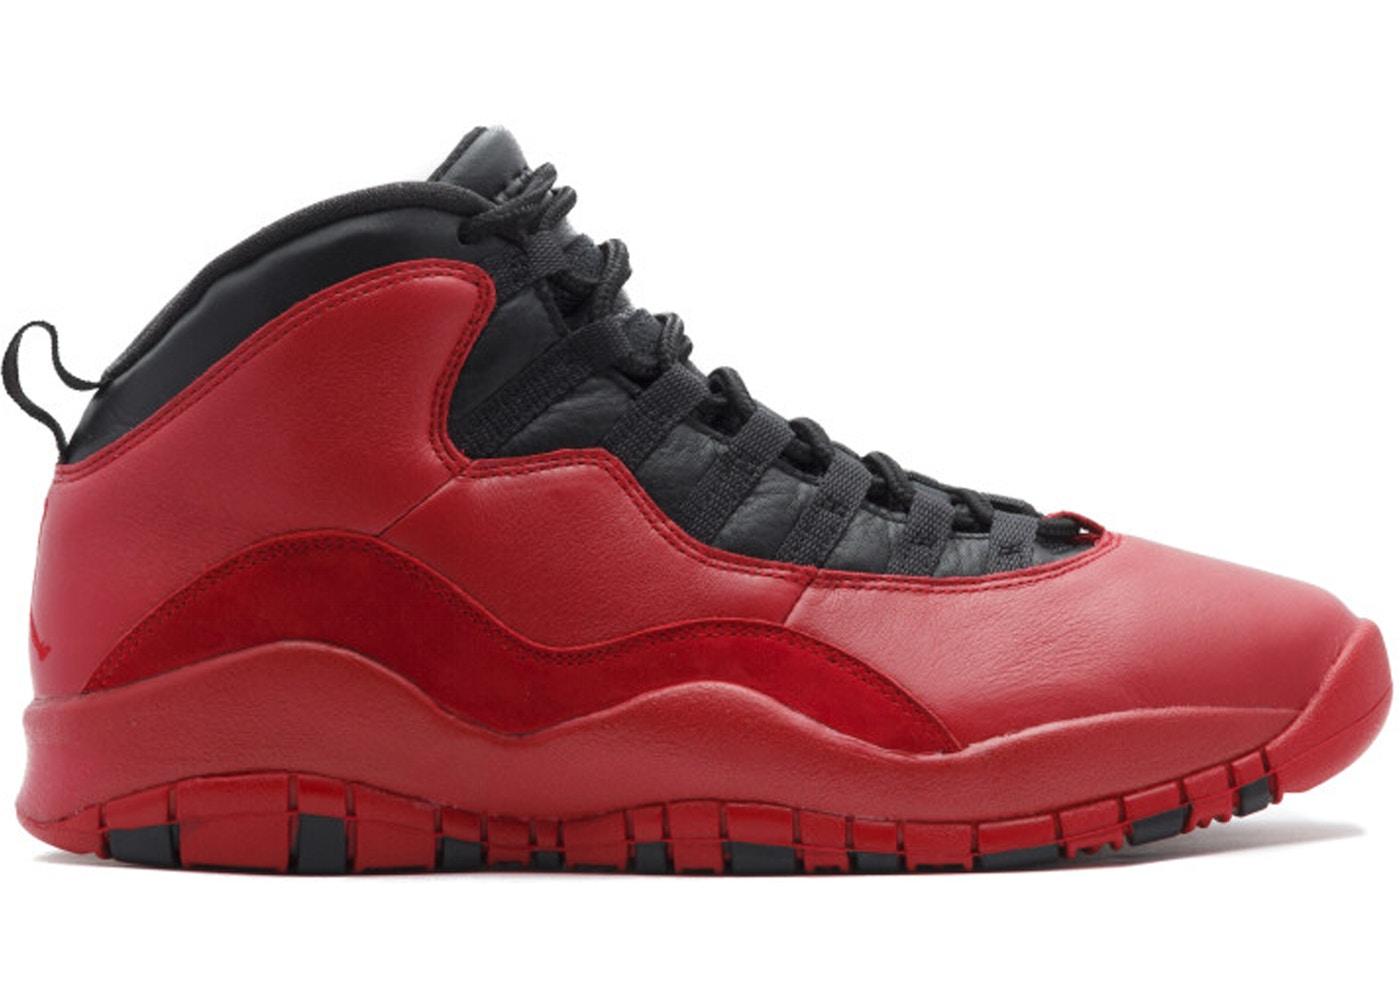 ff1da9302d175b Jordan 10 Retro PSNY Red - AJ10-542509